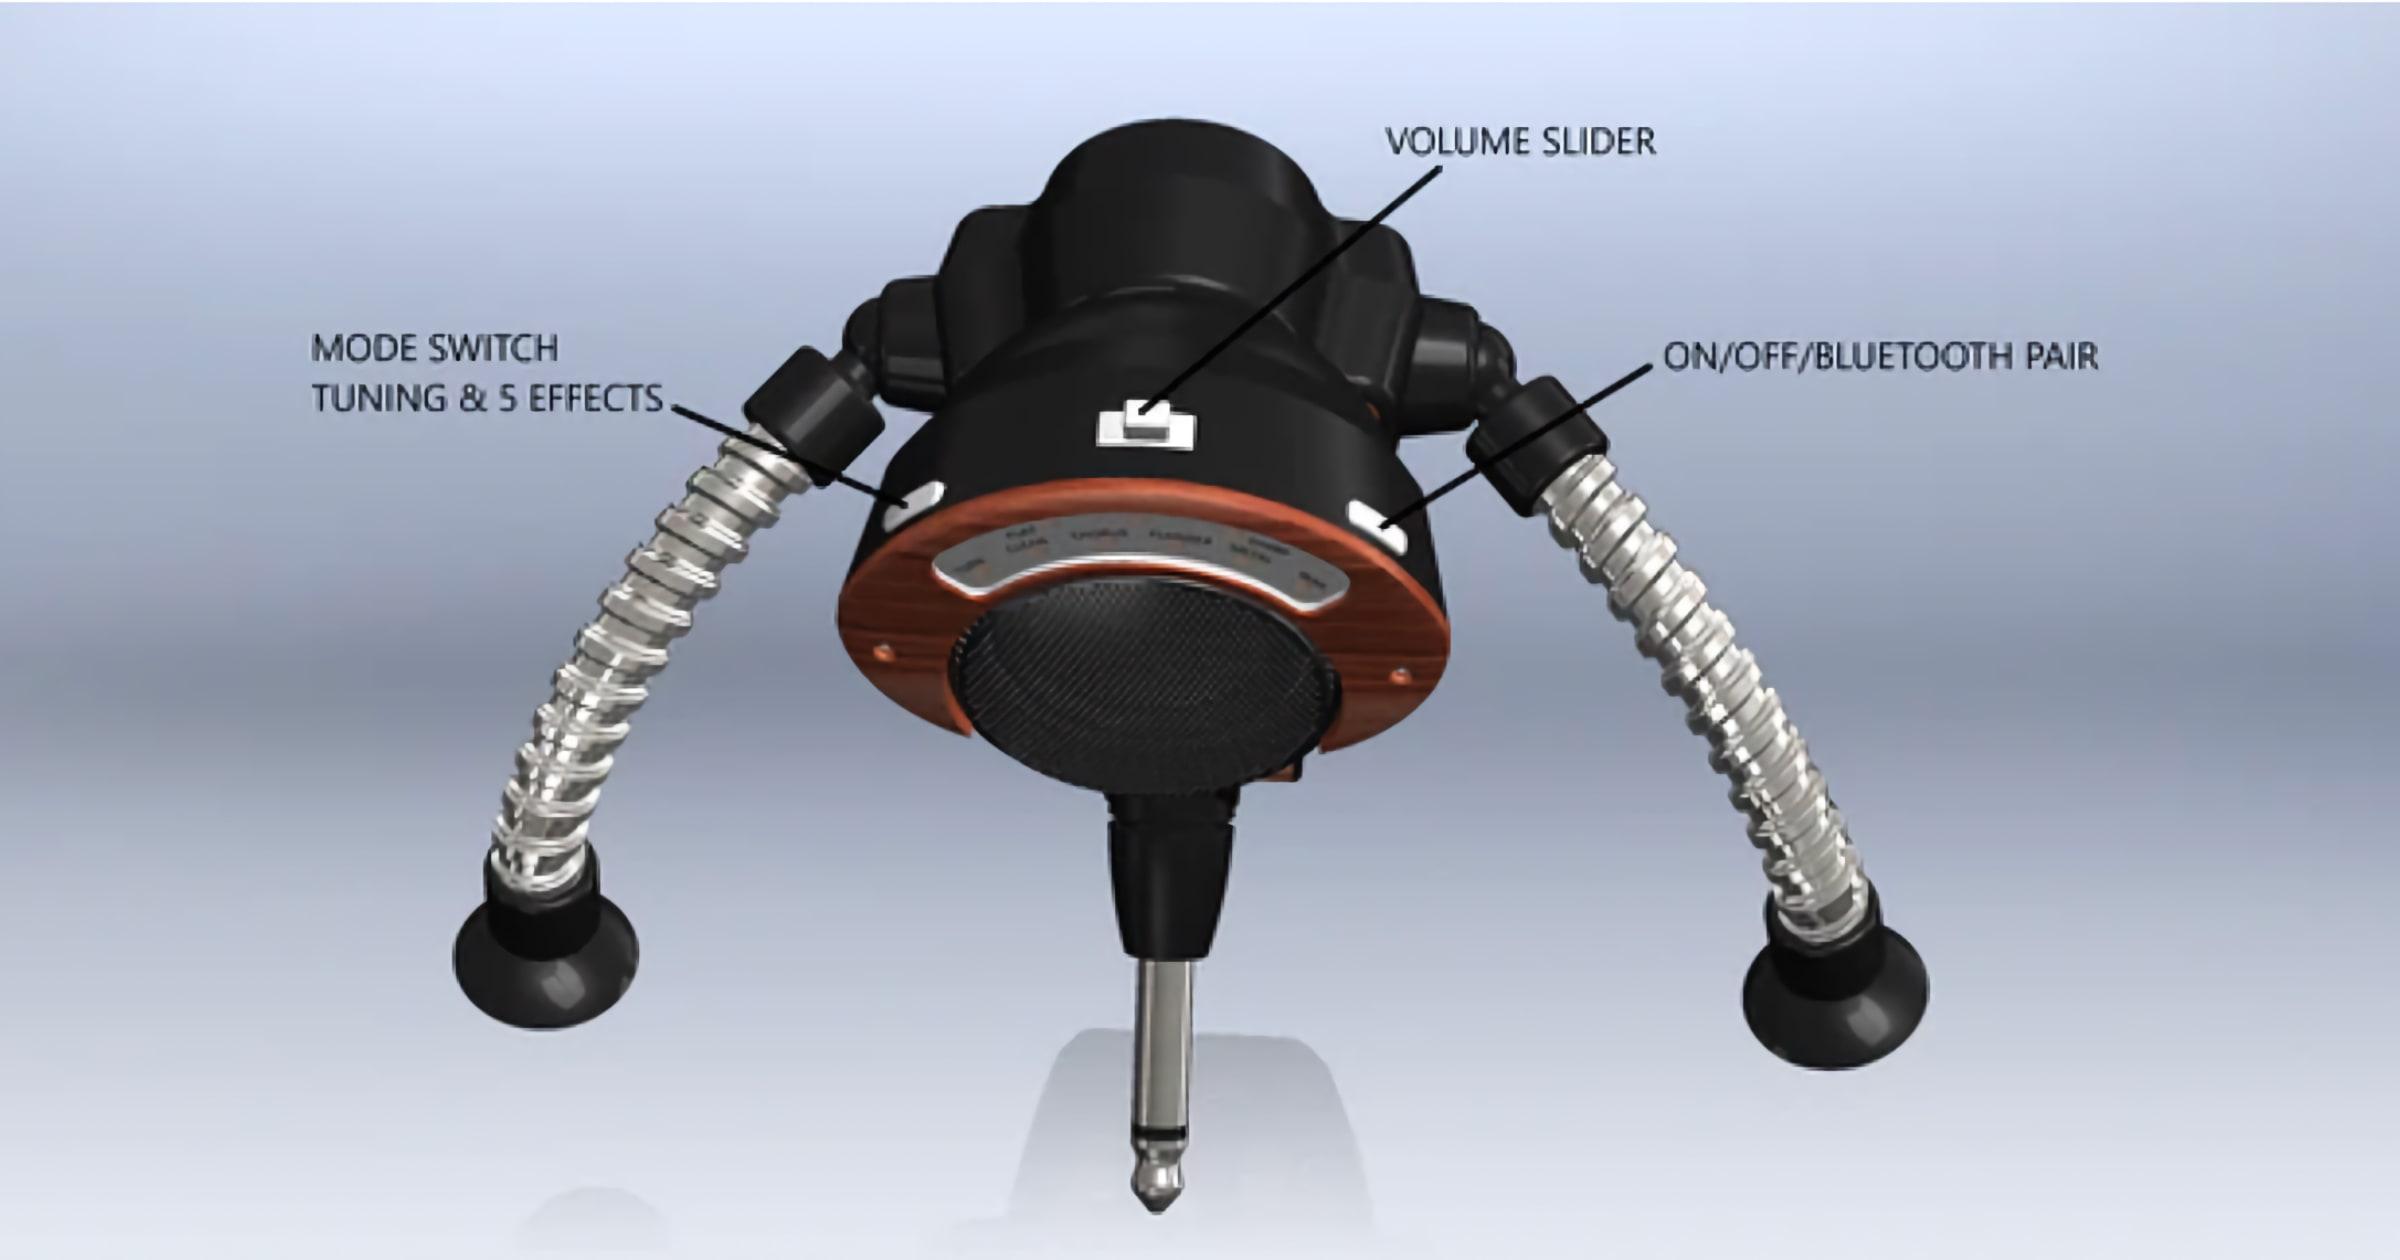 Portable Guitar Amp 'AMPBOT' Launches on Kickstarter